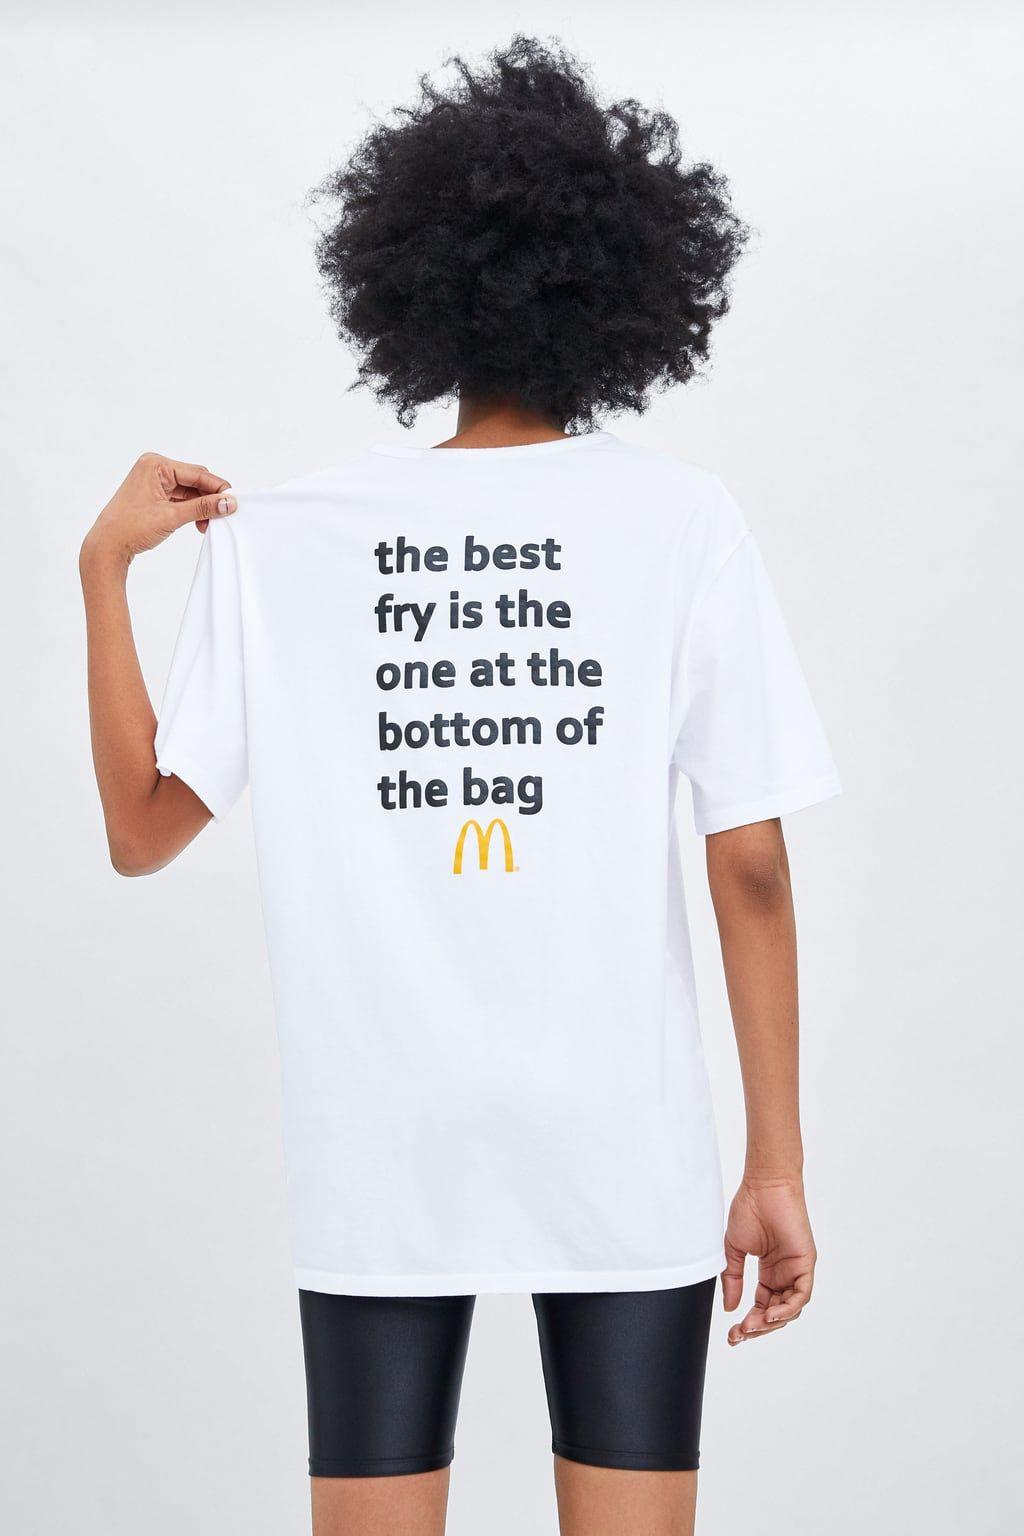 47c51dbbc7 2018 McDONALD'S UNISEX T-SHIRT in 2019 | Mcdonalds | T shirts for ...